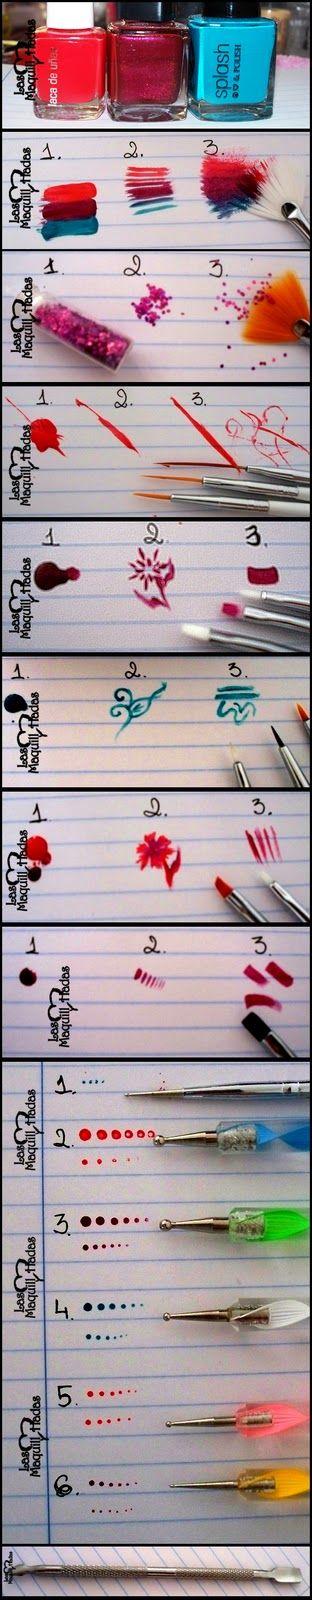 Tutorial: Pinceles para nail art y como utilizarlas [Nail art brushes and how to use them] | ! Laura♥LMH !